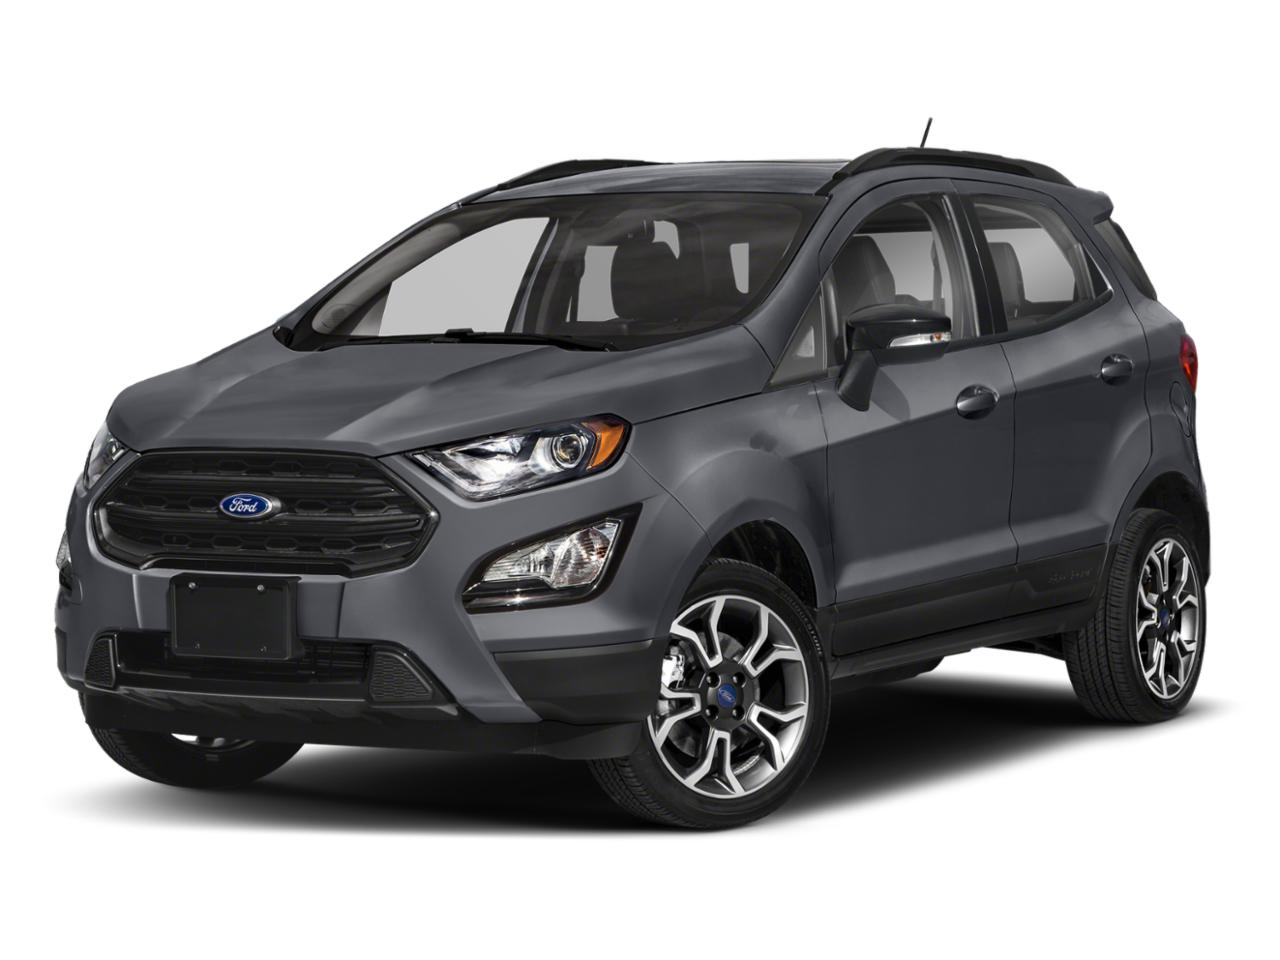 Smoke Metallic 2020 Ford EcoSport TITANIUM Titanium 4dr Crossover New Bern NC